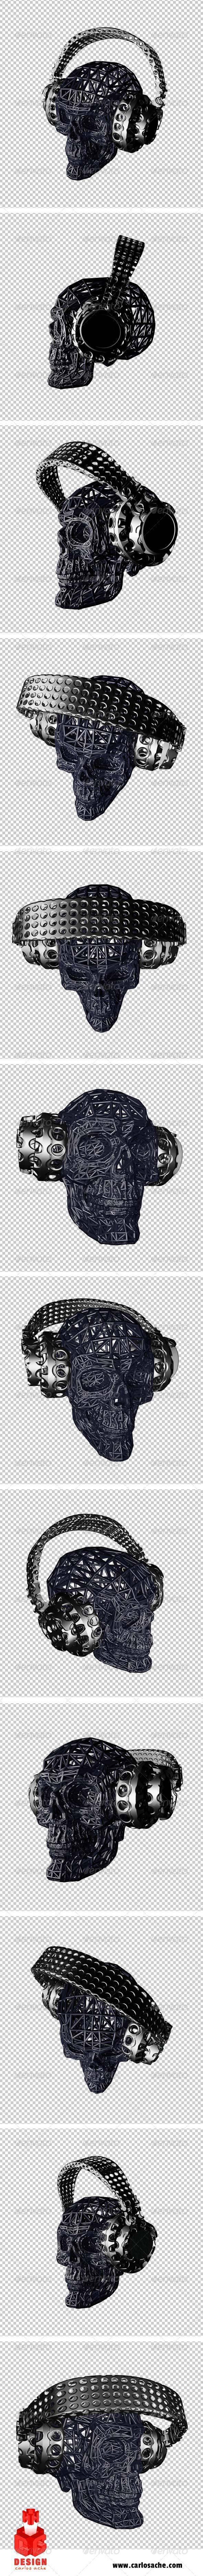 Skulls Dj´s - Twelve Views - Characters 3D Renders